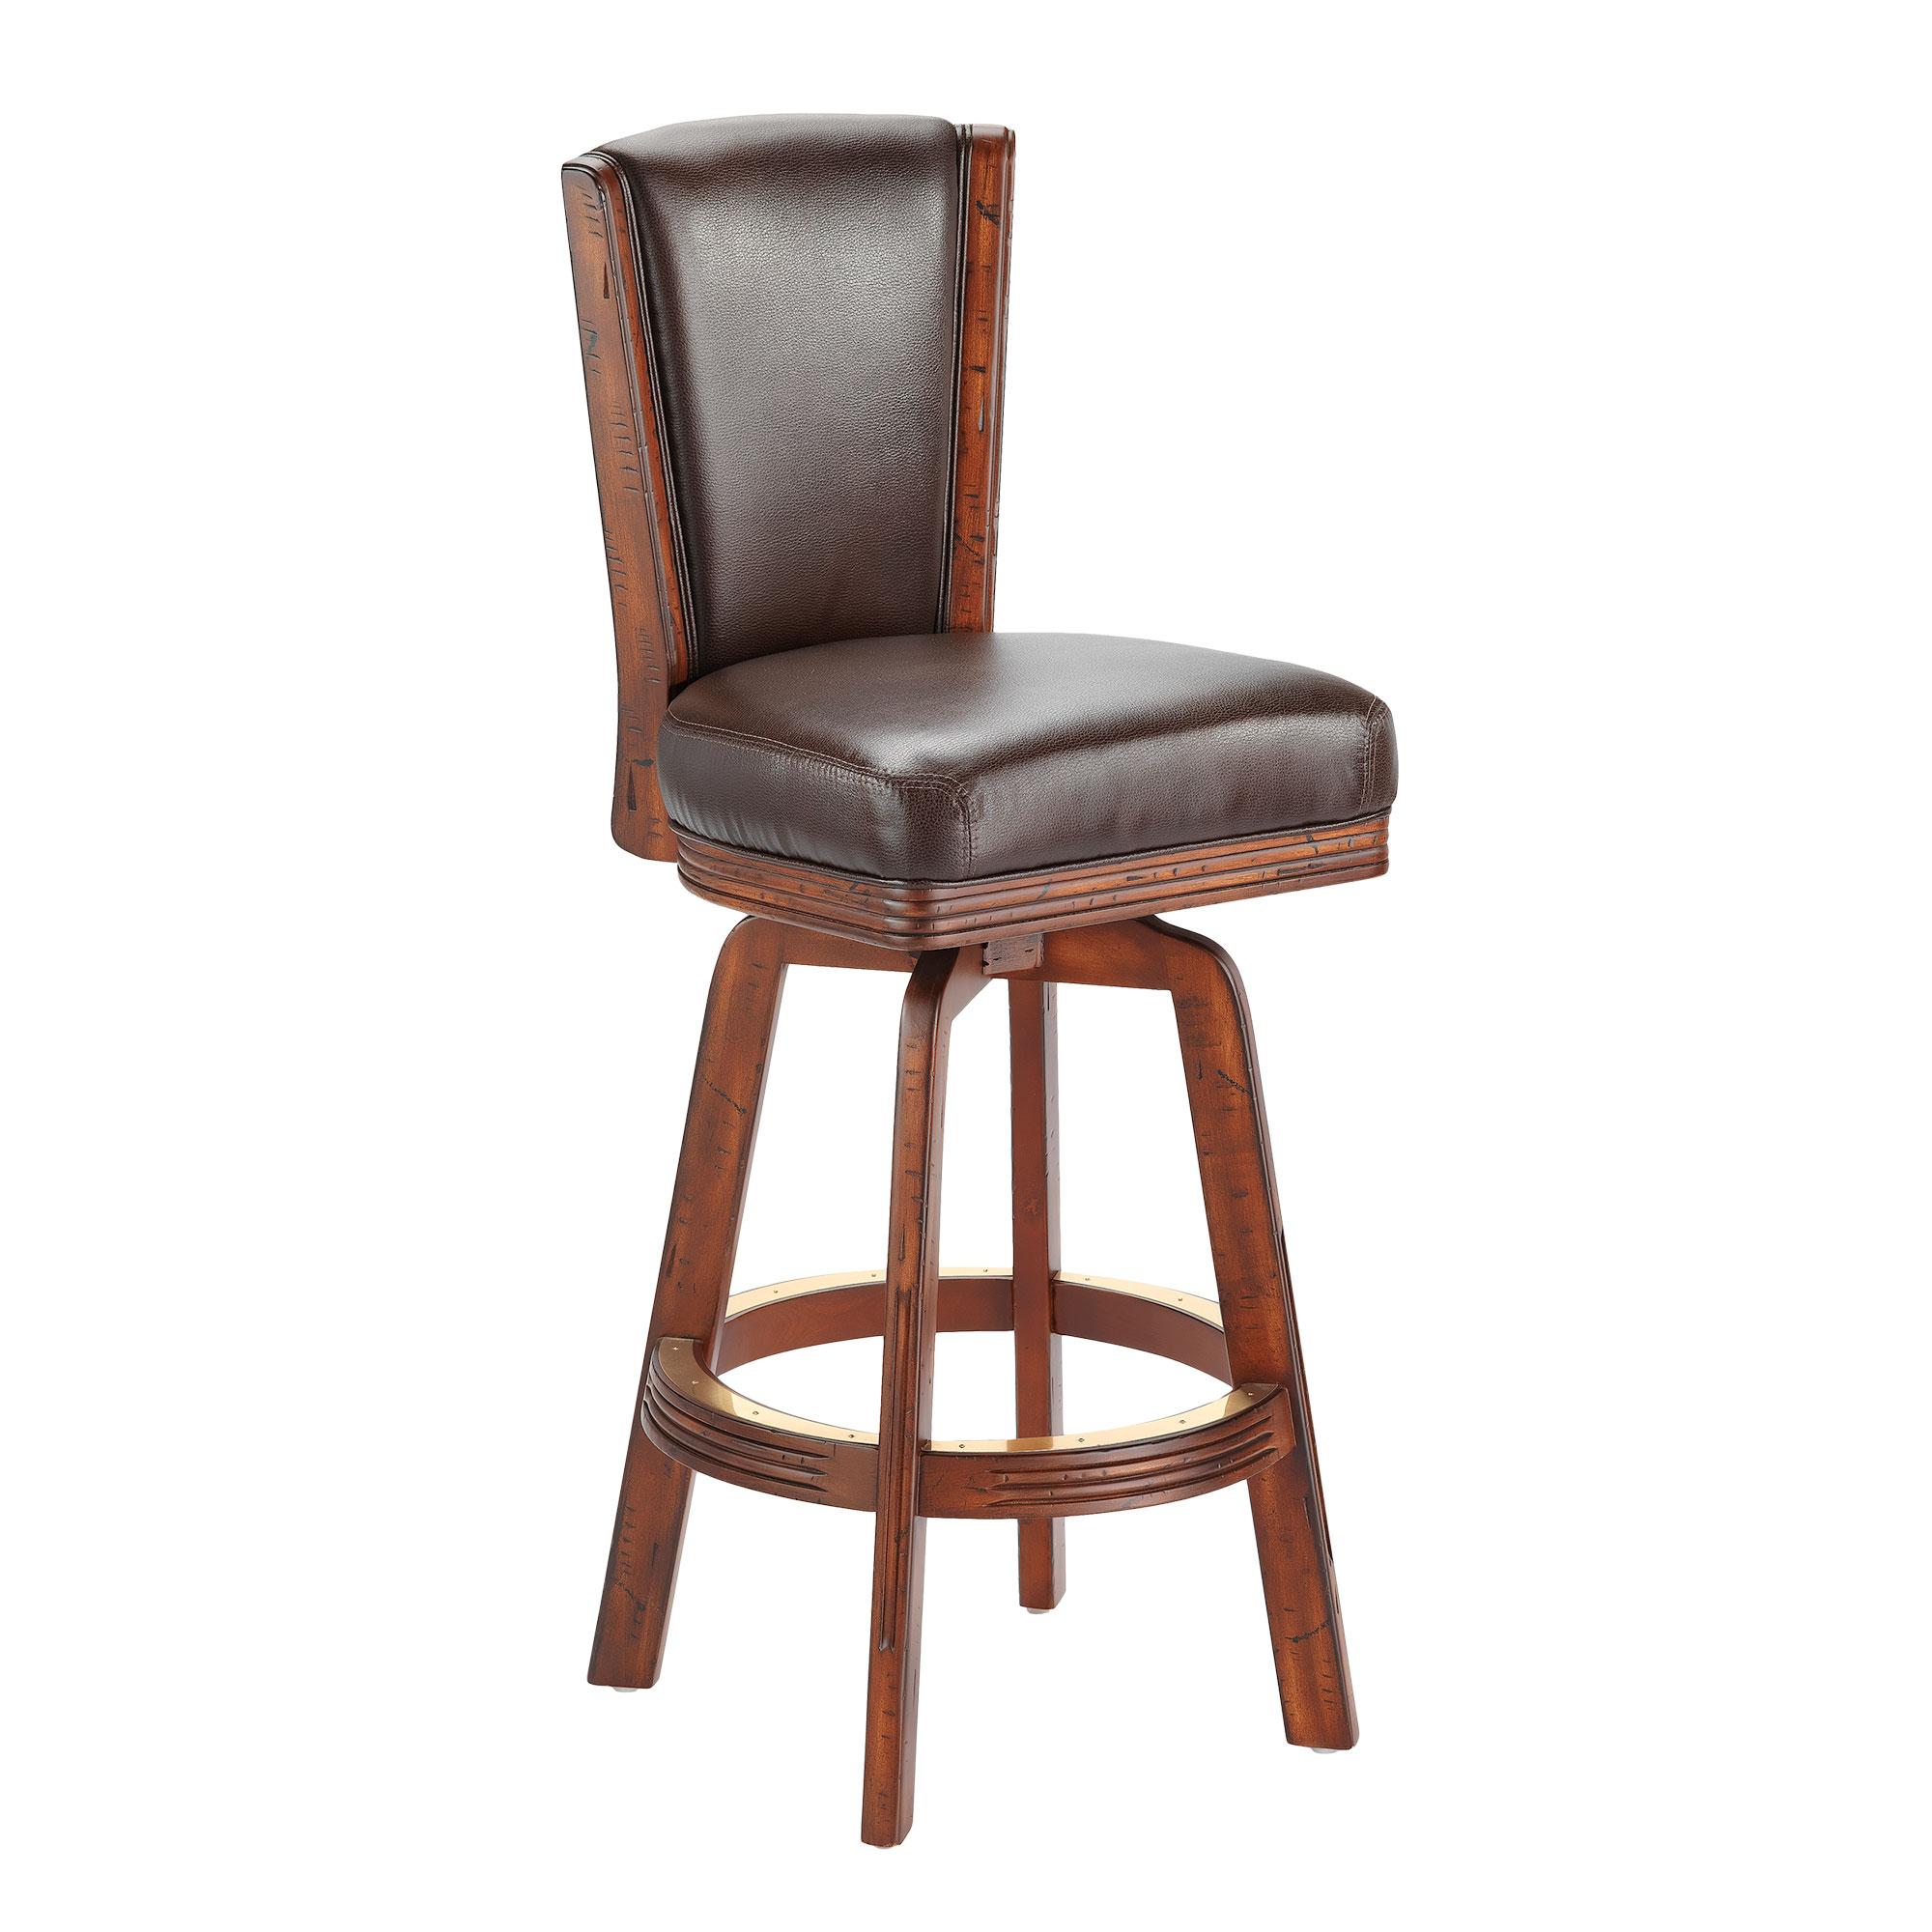 Terrific 915 Flexback Barstool Darafeev Andrewgaddart Wooden Chair Designs For Living Room Andrewgaddartcom